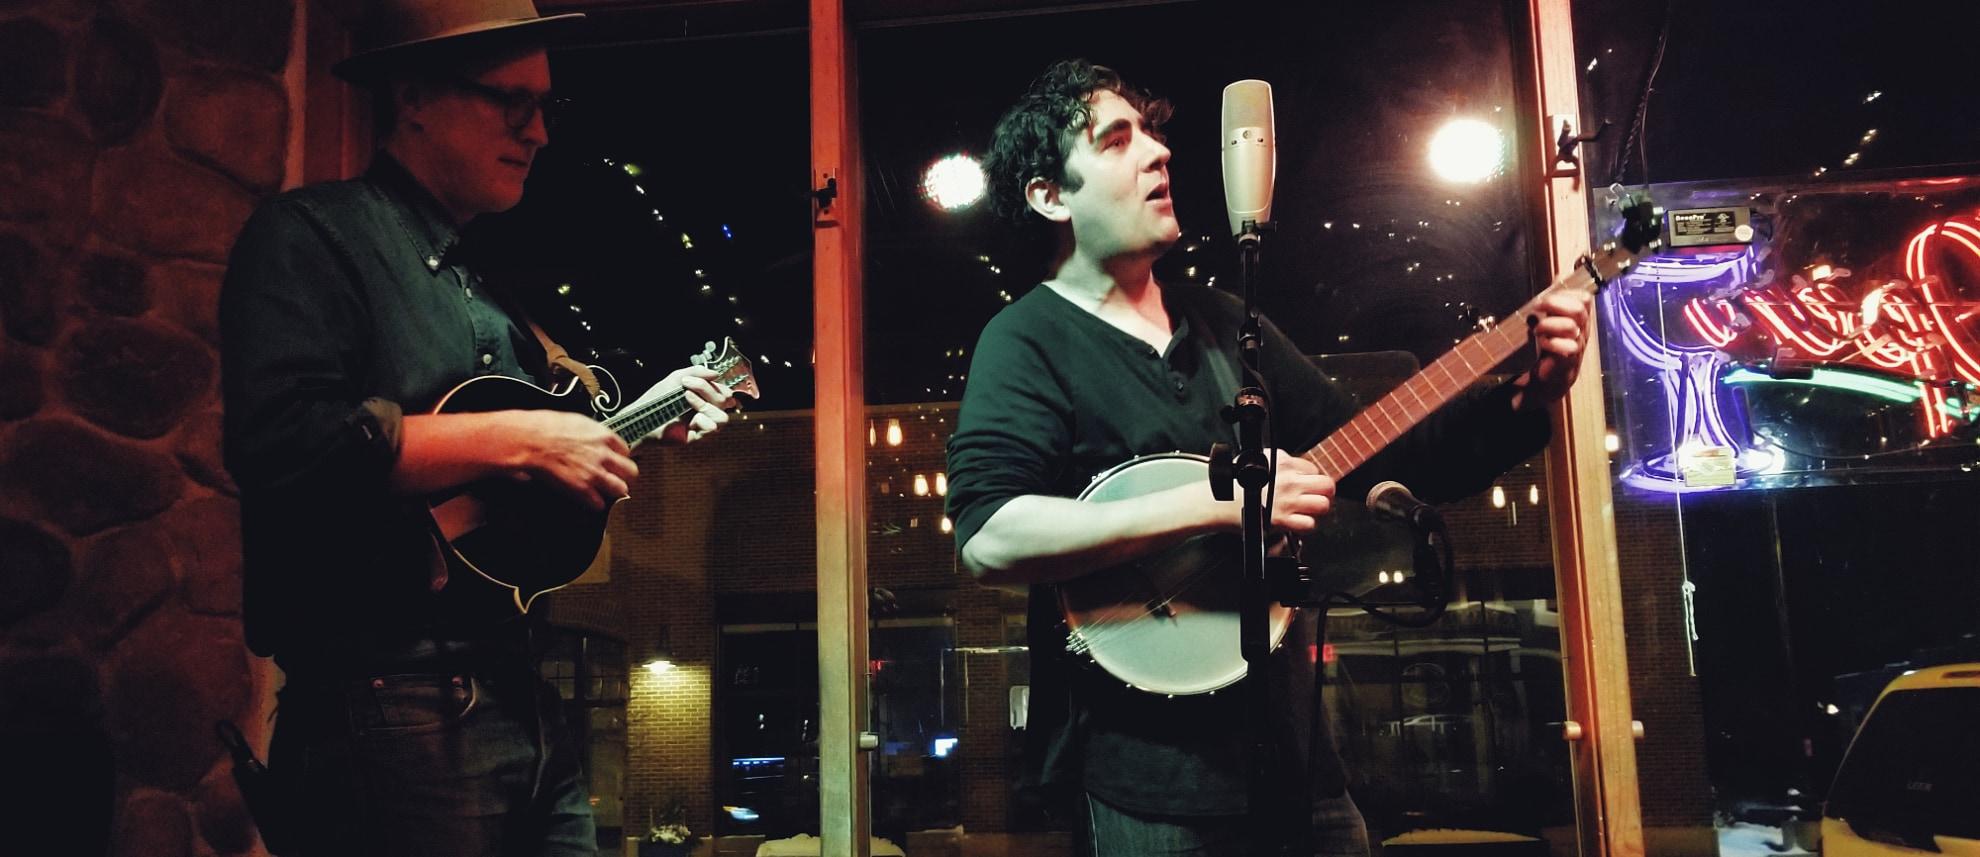 Anthony Ihrig - Musician & Banjo Teacher